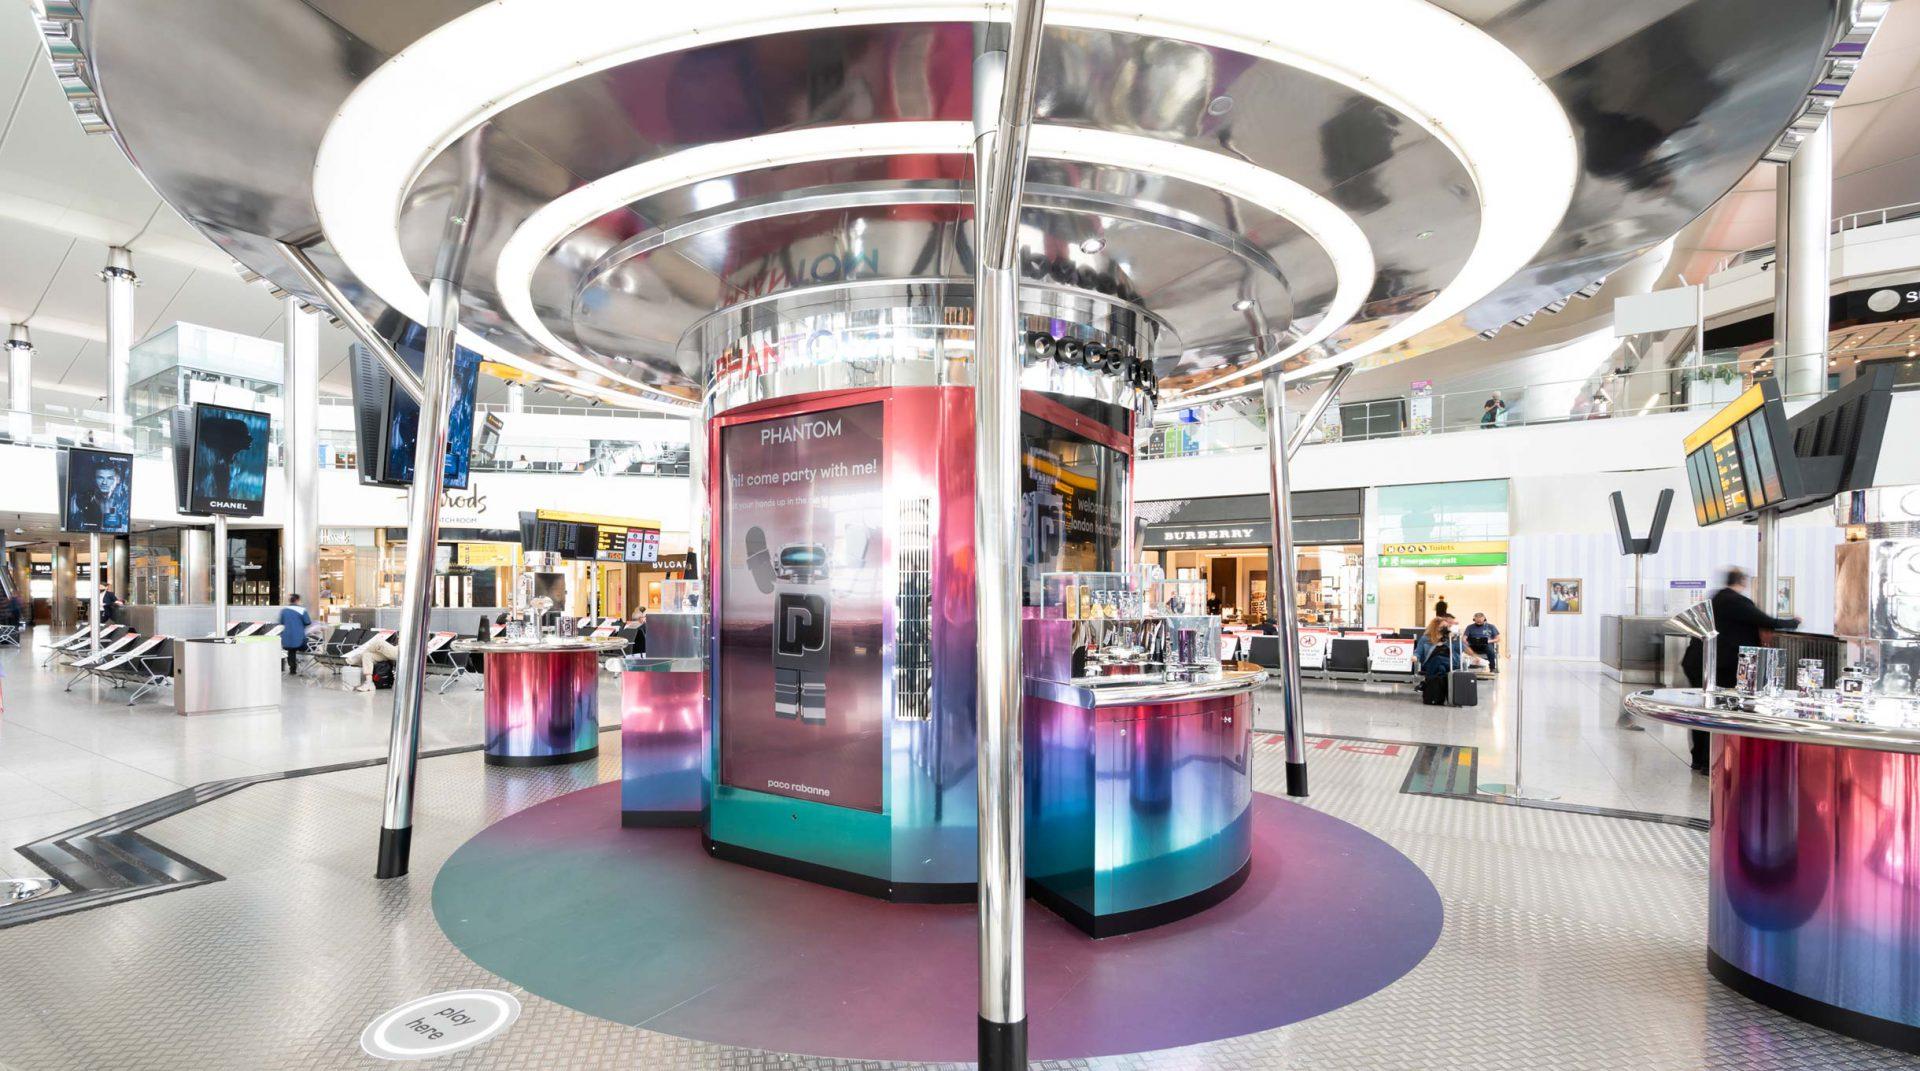 Paco Rabanne Phantom Heathrow Terminal 2